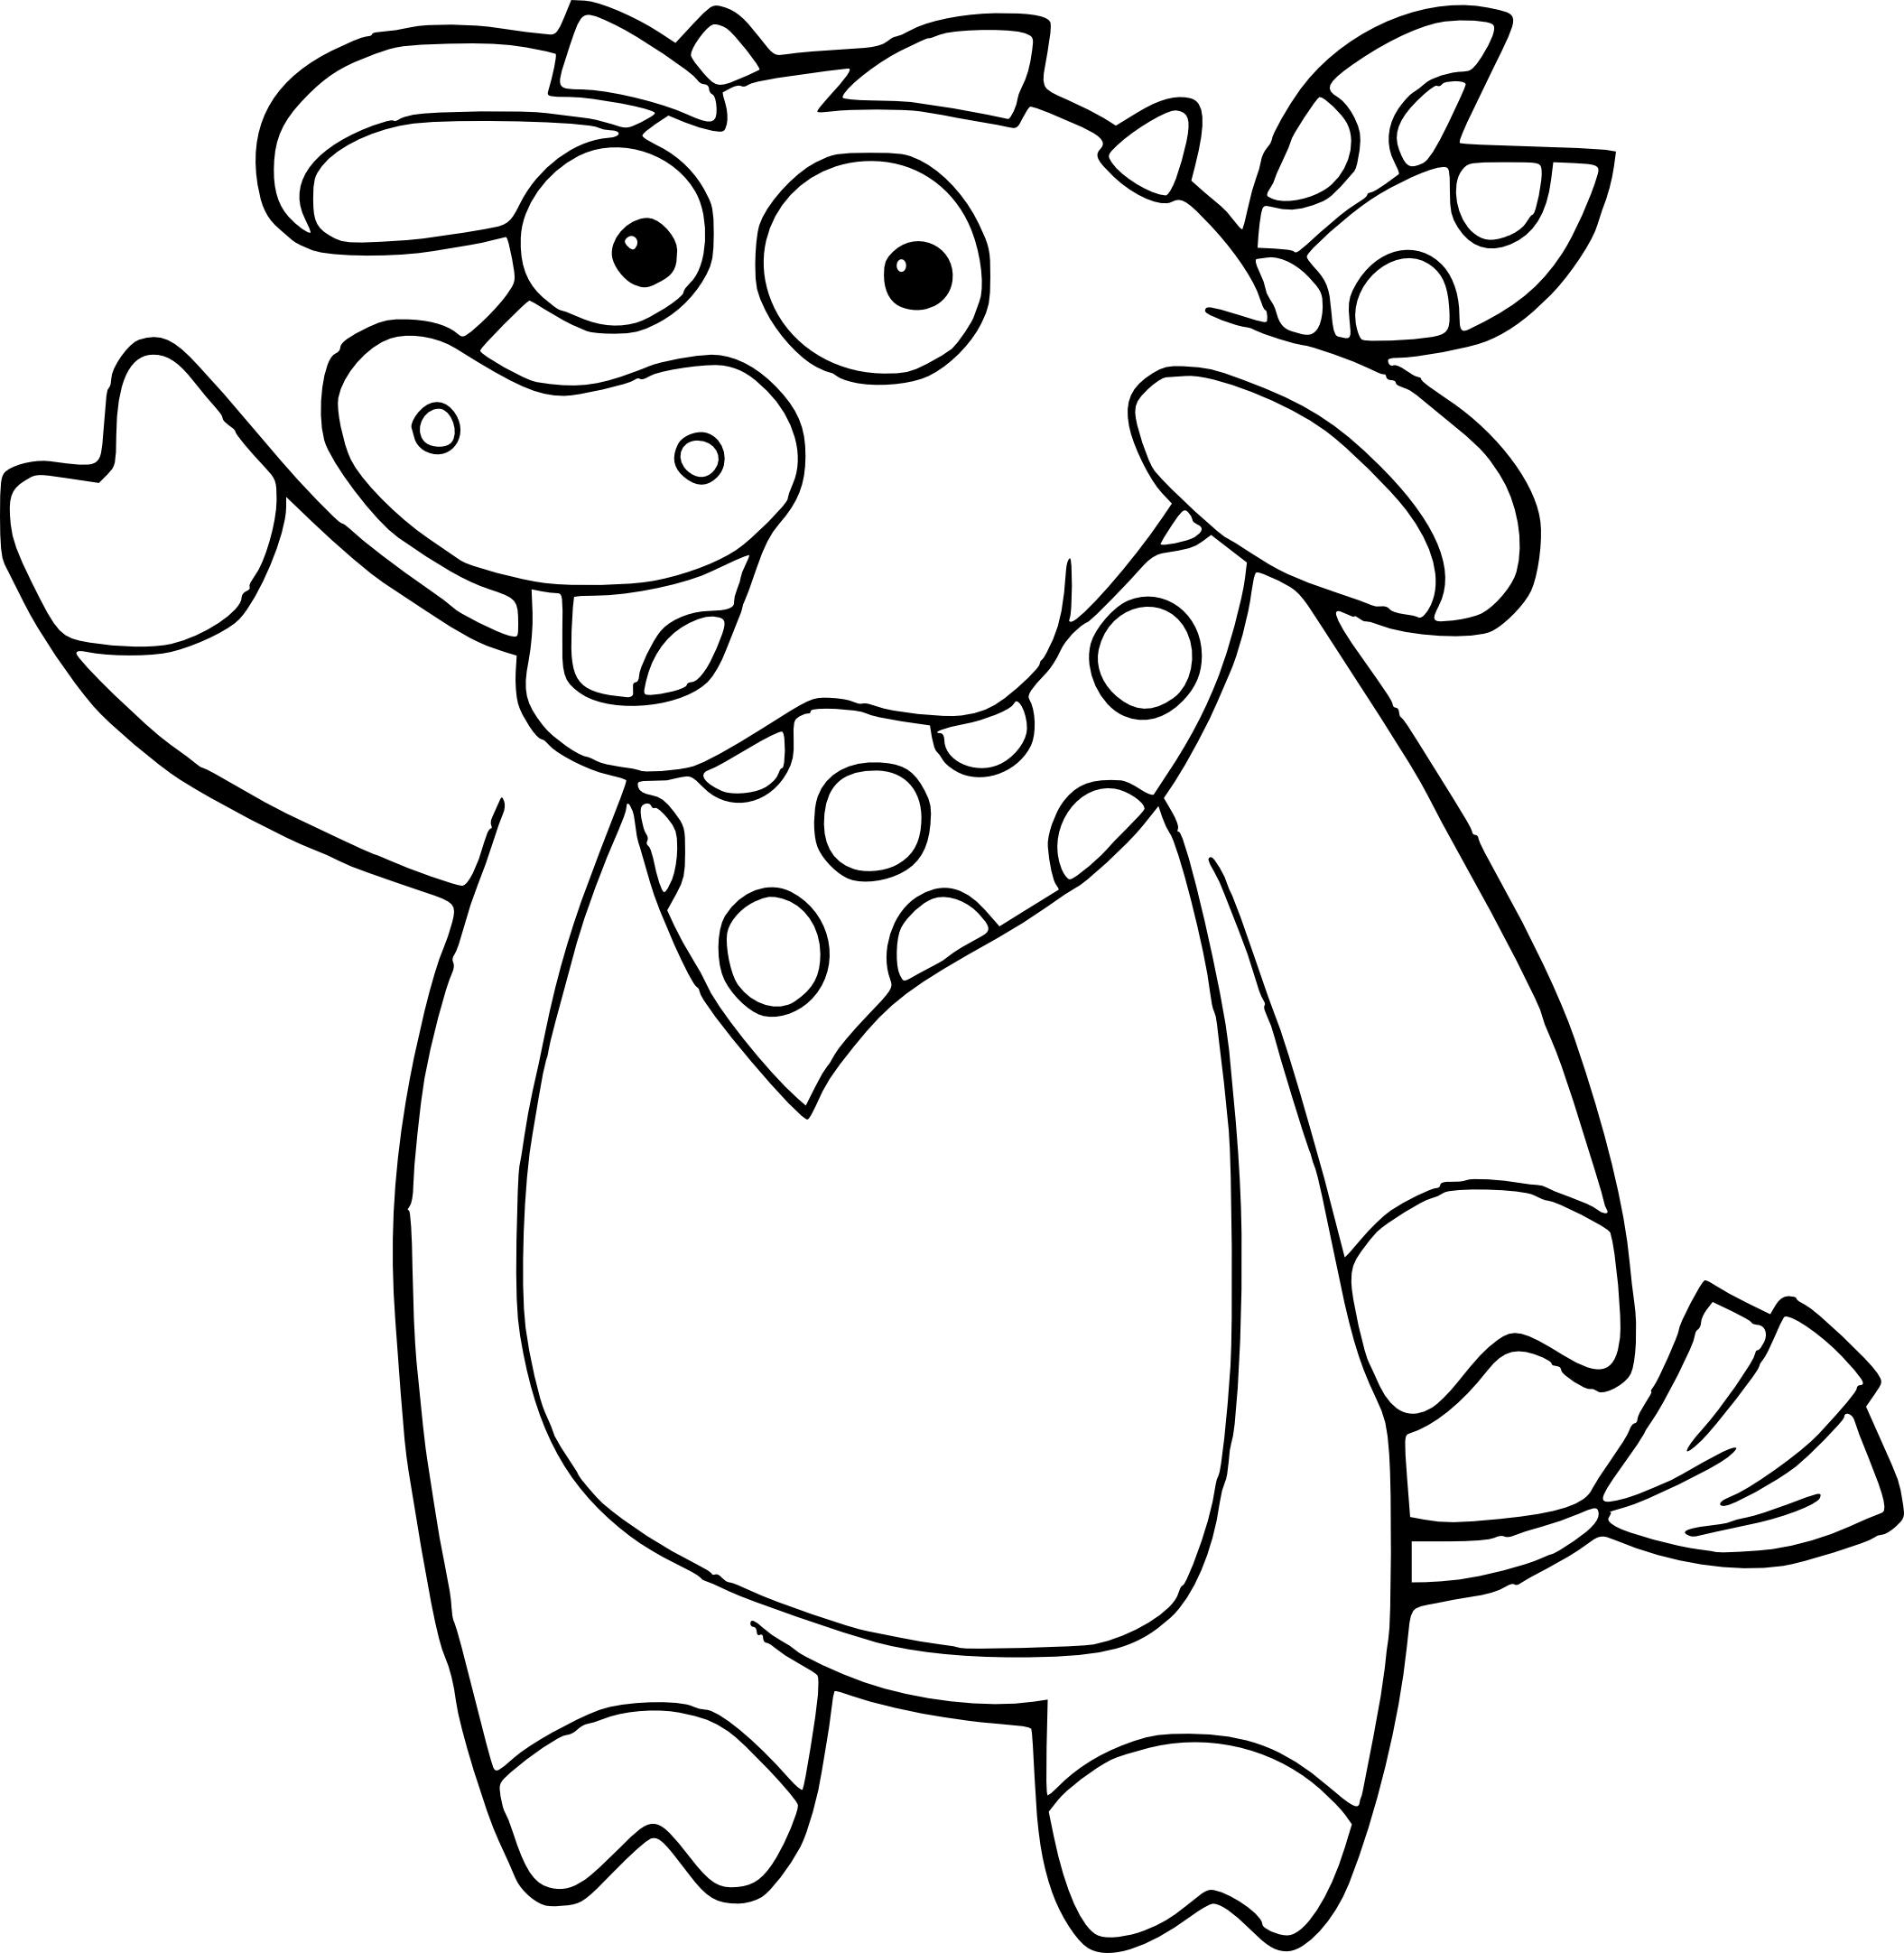 Coloriage vache Dora l'exploratrice